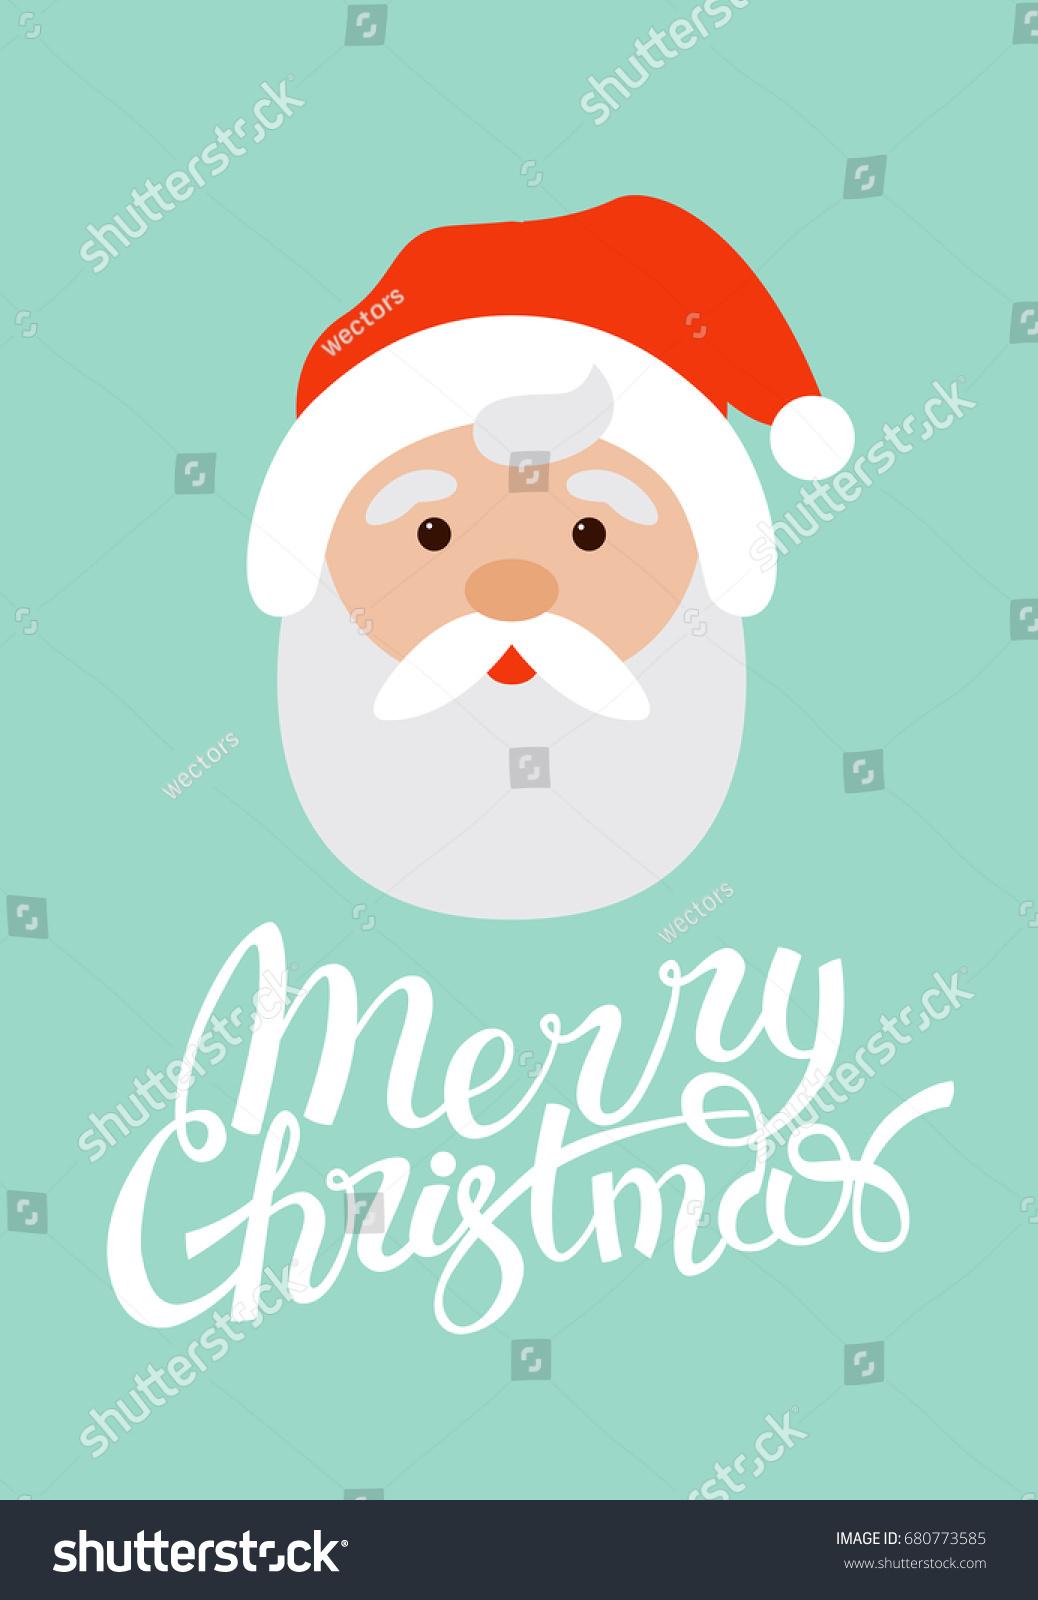 Merry Christmas Design Santa Claus Greeting Stock Vector 680773585